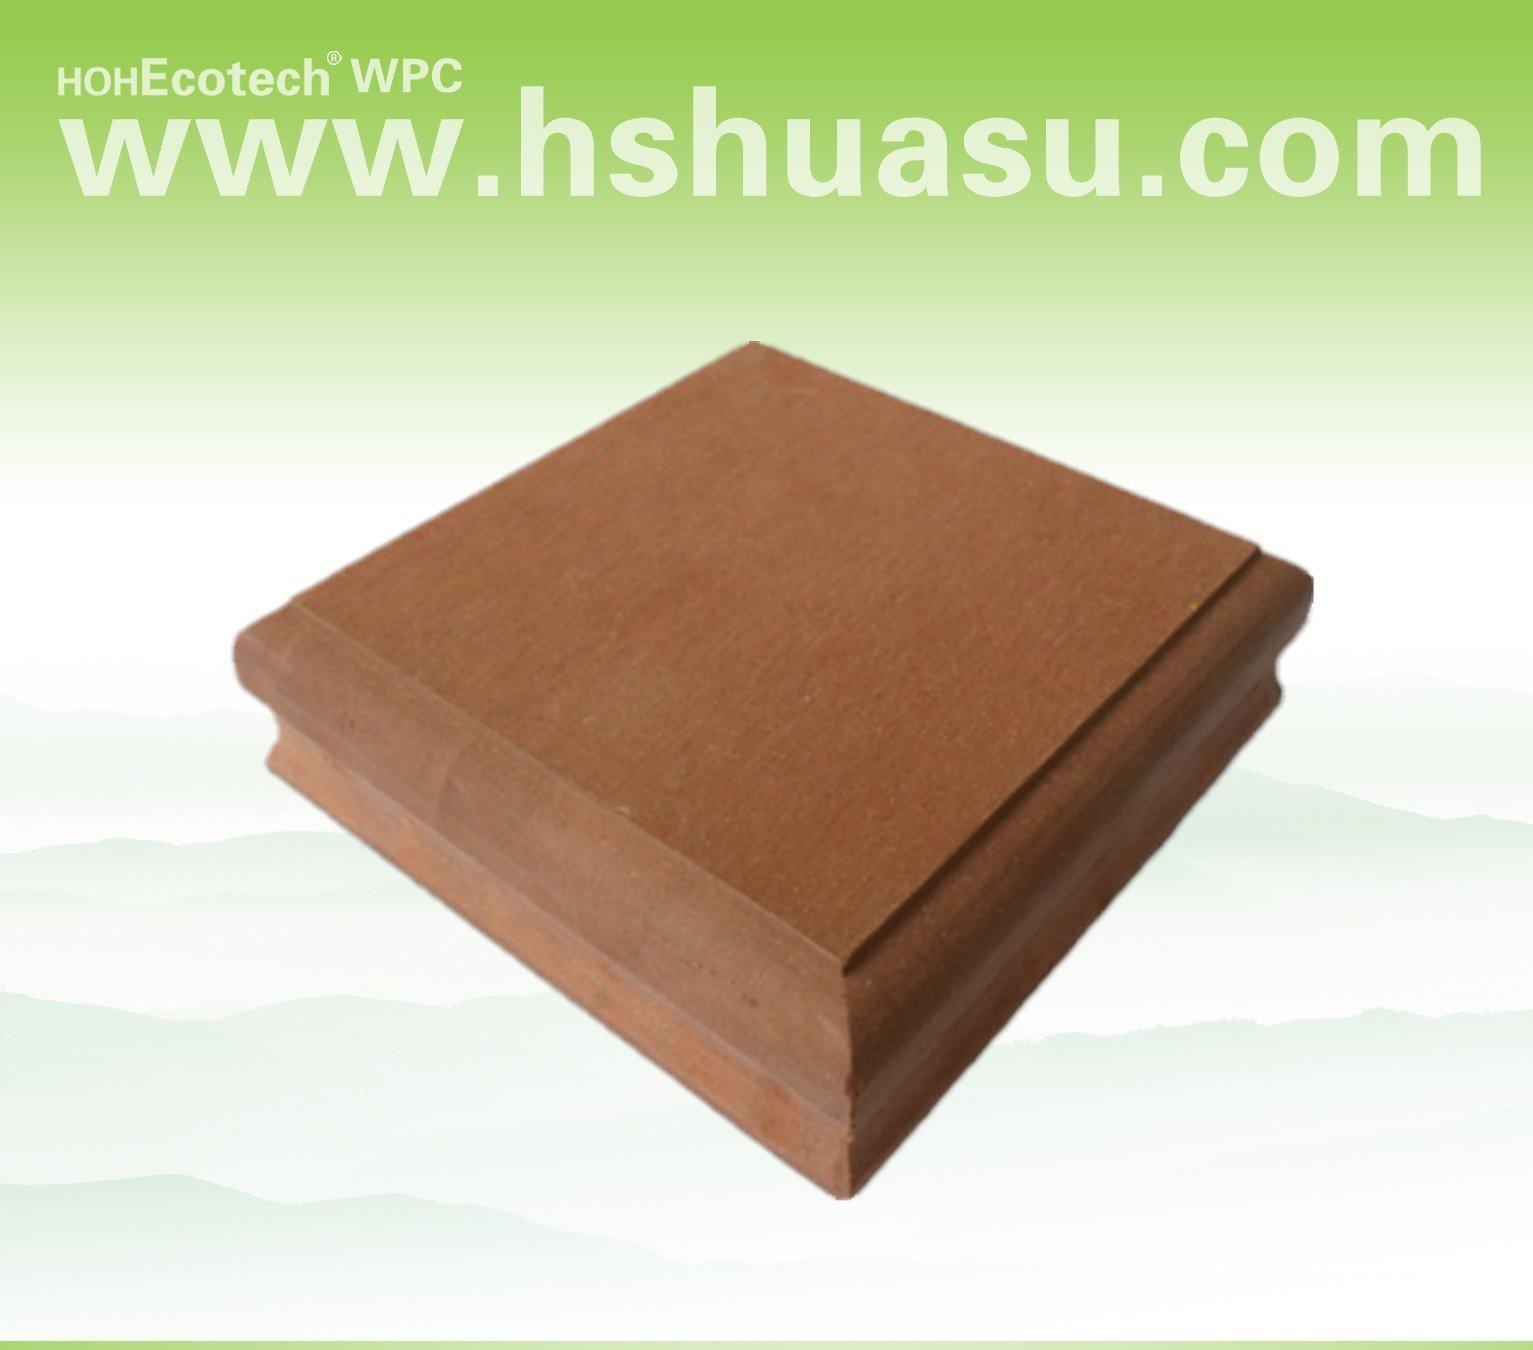 HM-120-1 120X120mm_